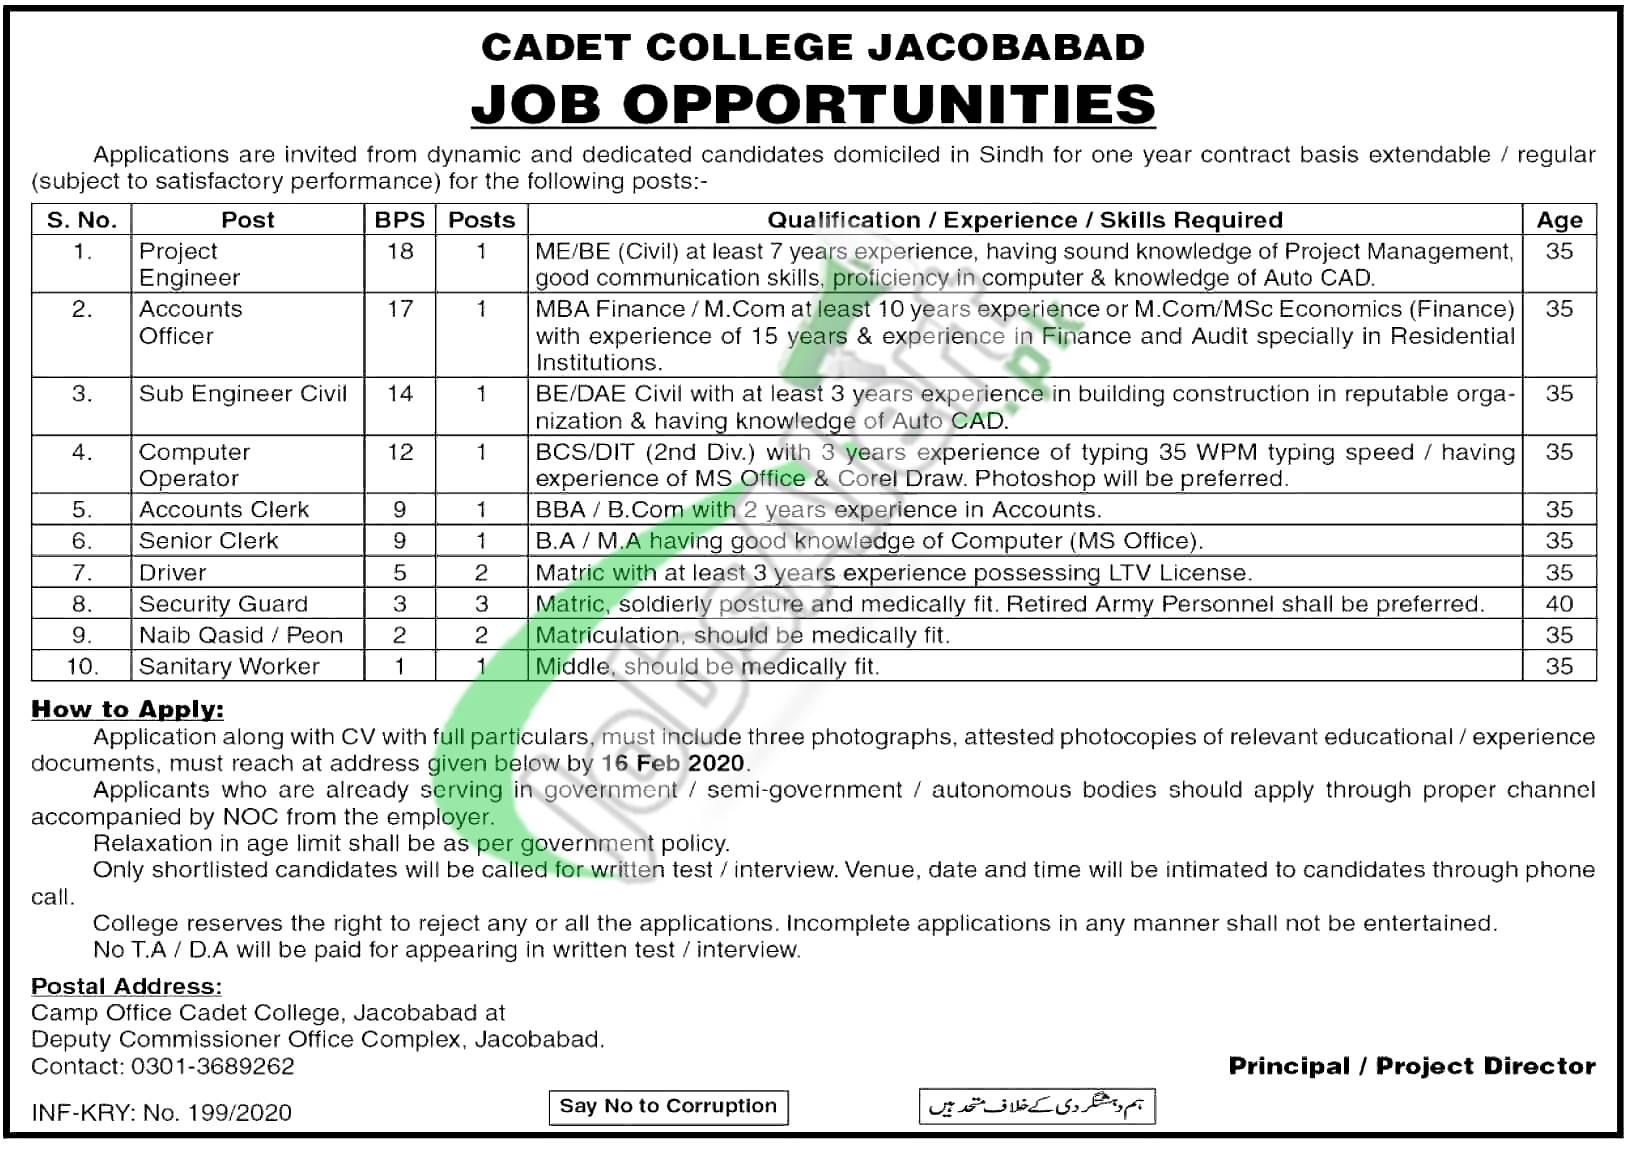 Cadet College Jacobabad Job Opportunities